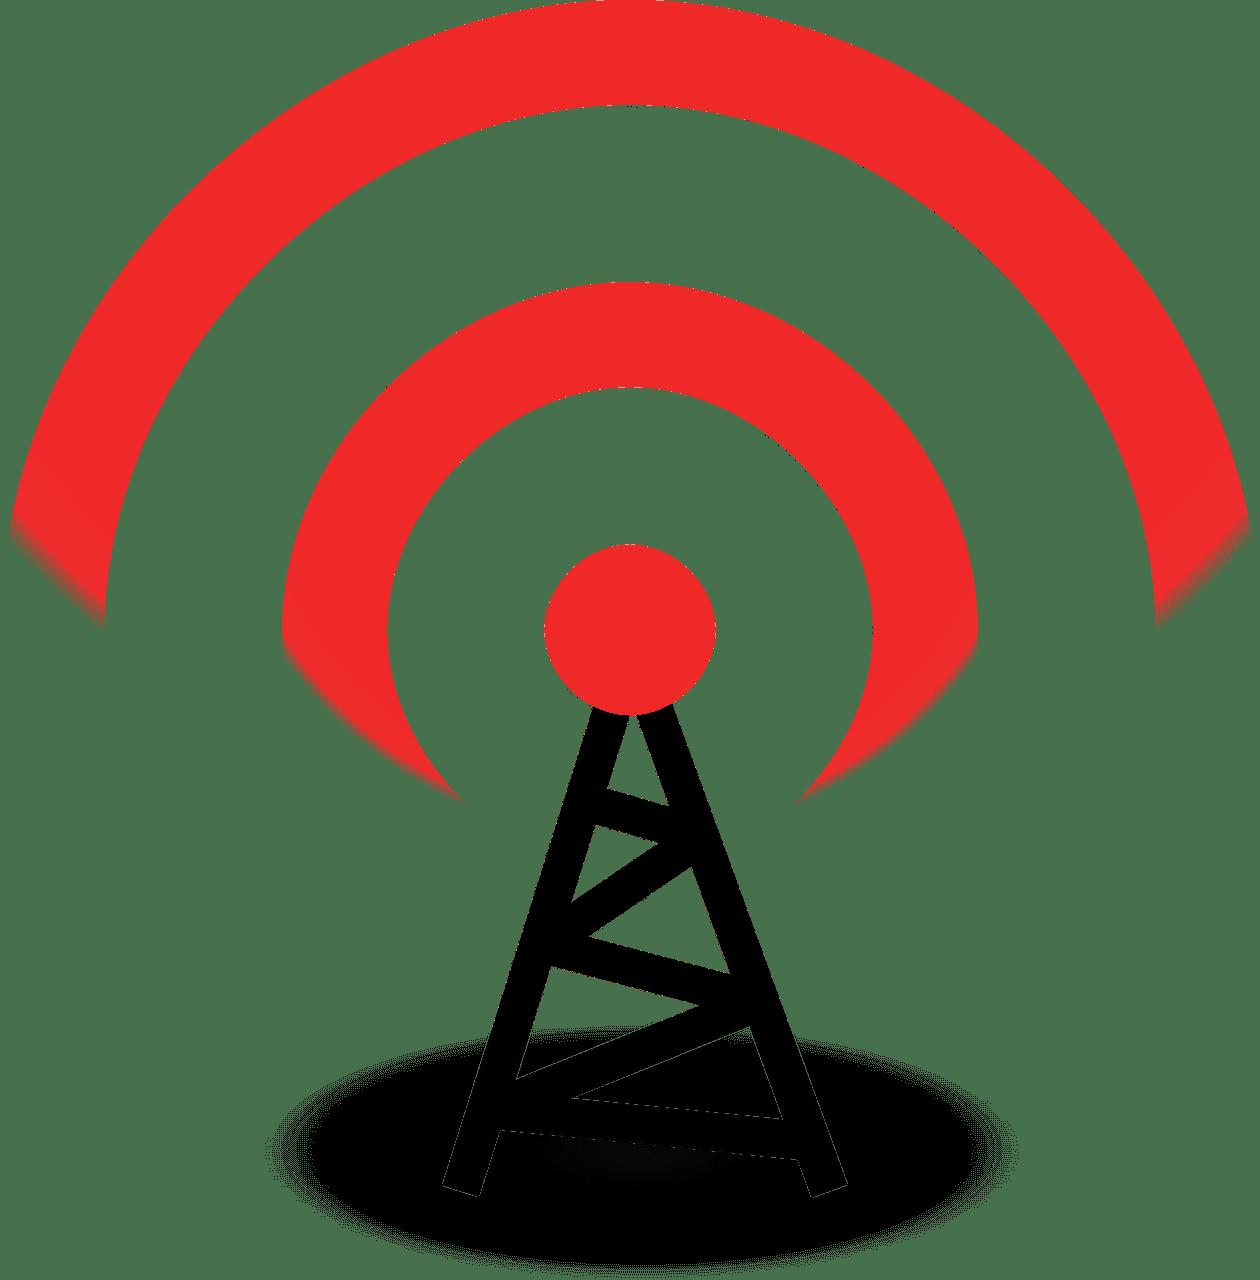 network-160644_1280